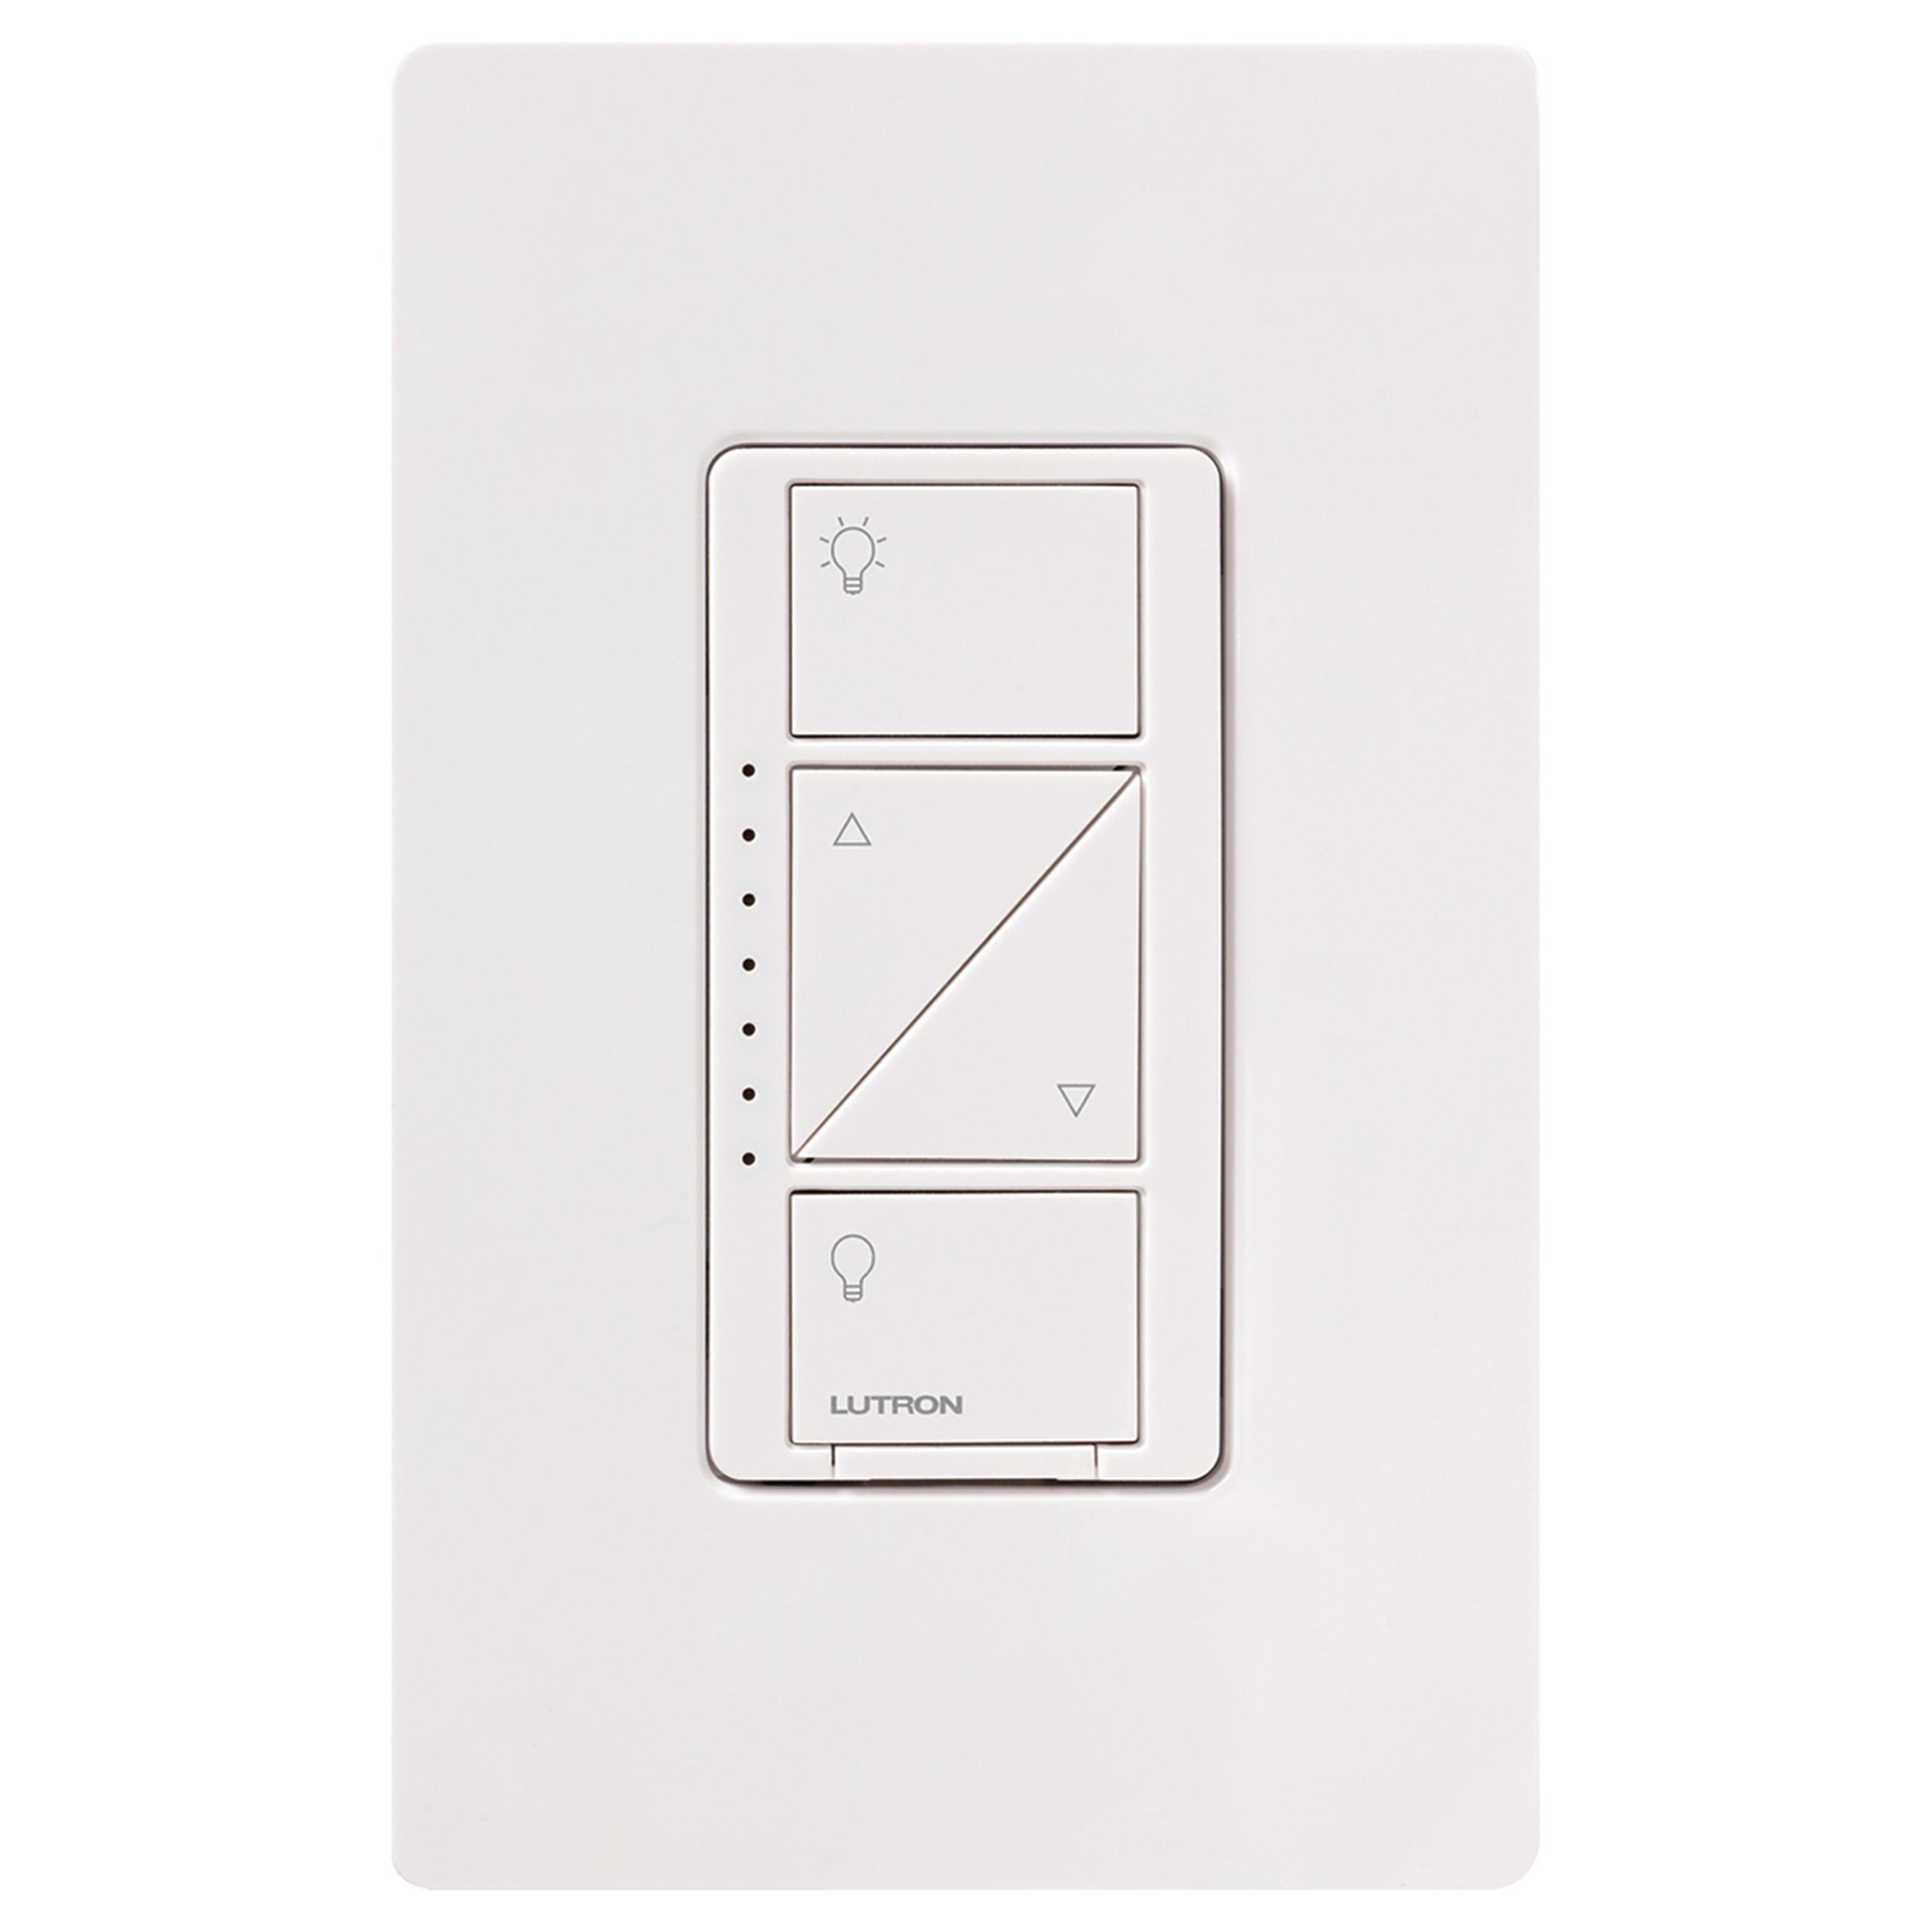 lutron p bdg pkg2w caseta wireless smart lighting in wall dimmer kit homekit enabled. Black Bedroom Furniture Sets. Home Design Ideas